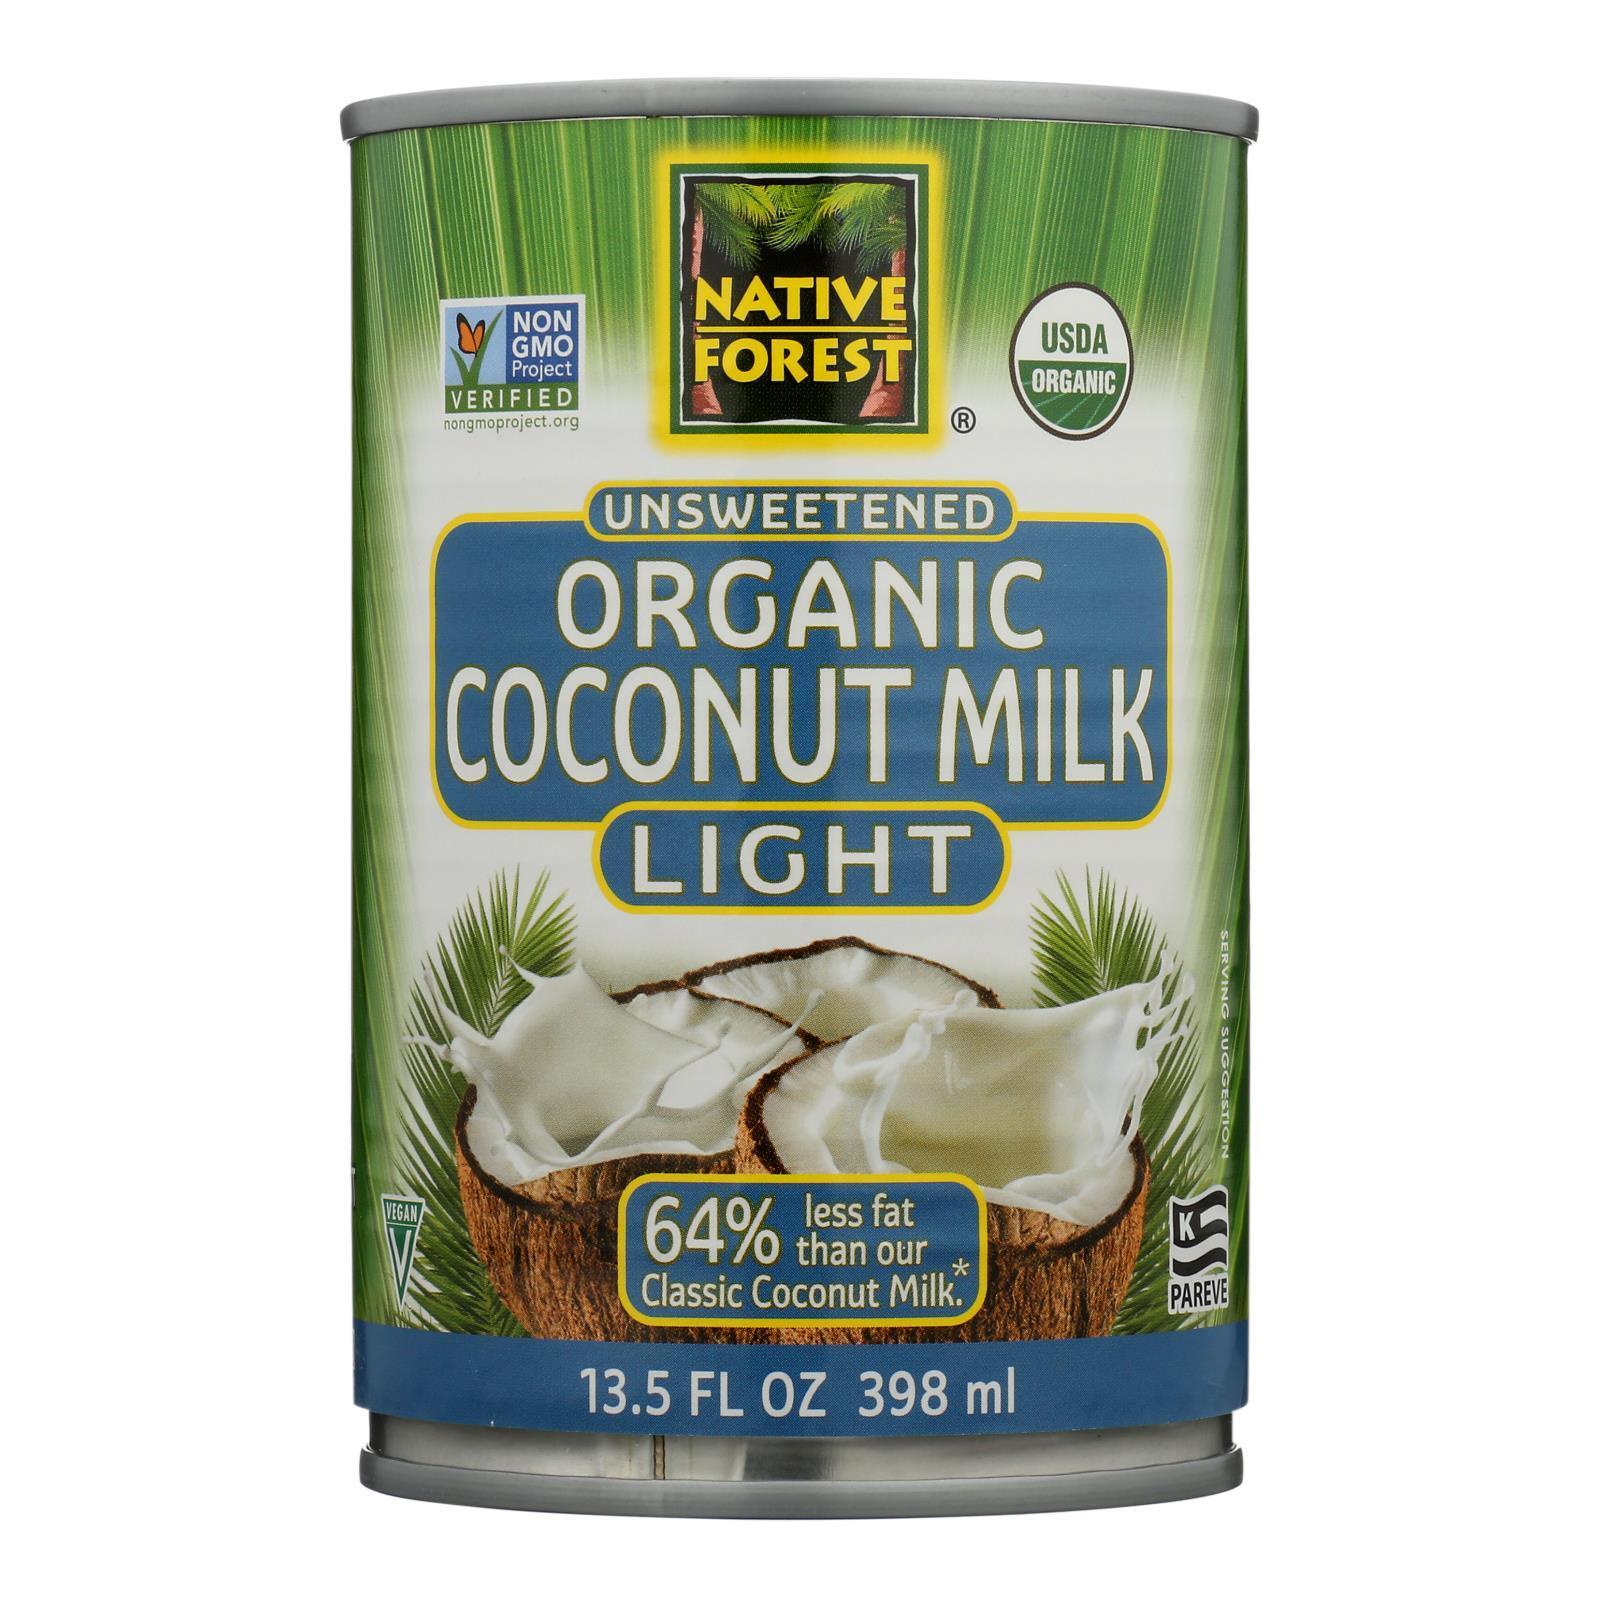 Native Forest Organic Light Milk - Coconut - Case of 12 - 13.5 Fl oz.